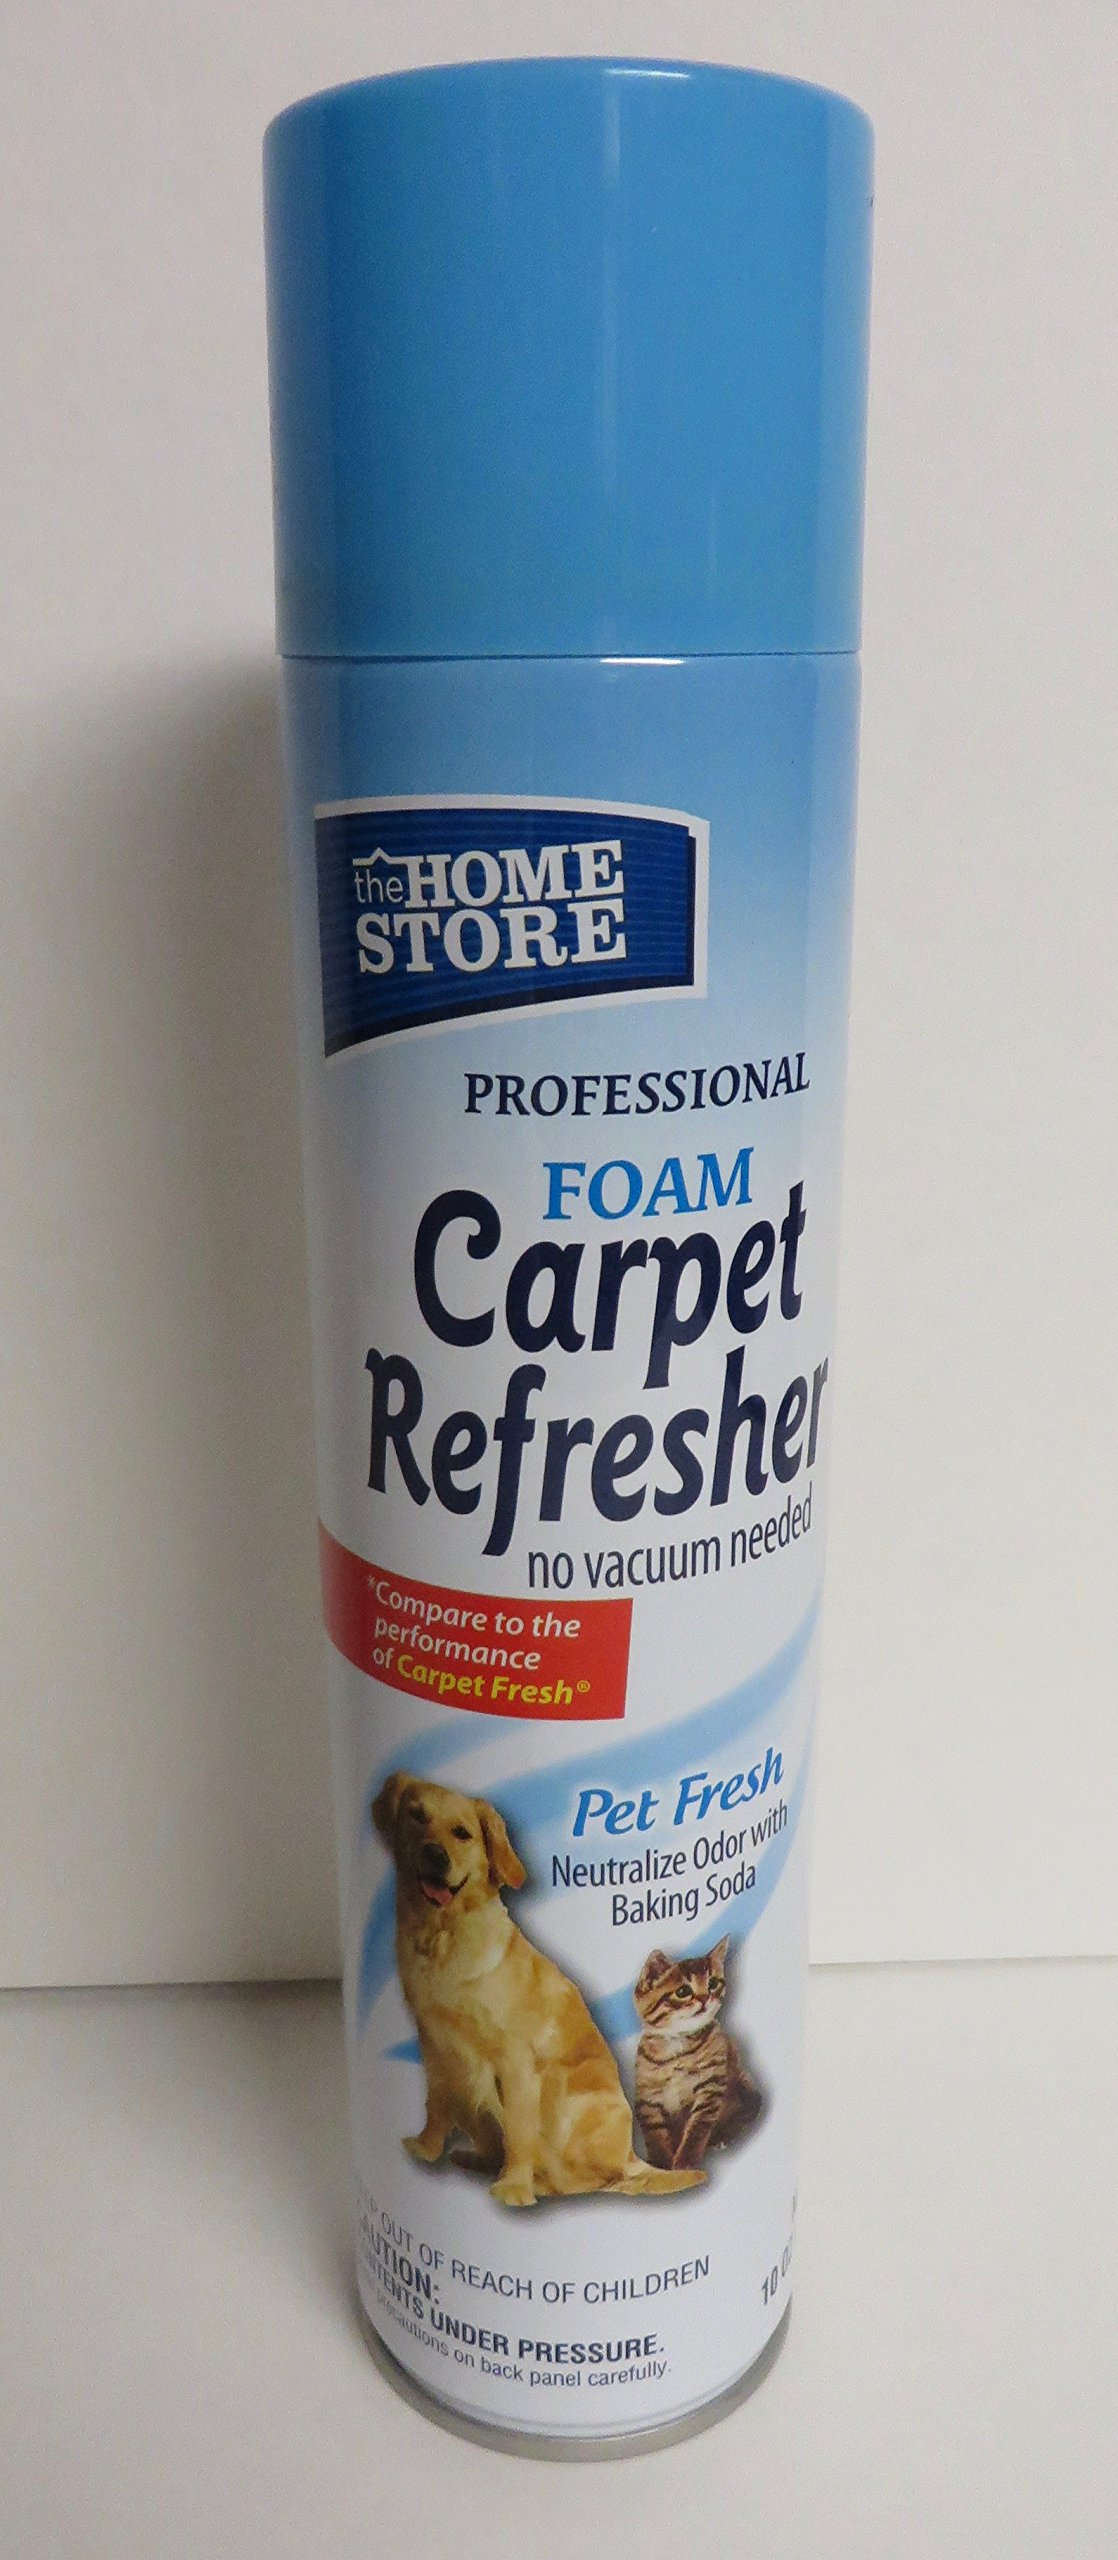 Professional Foam Carpet Refresher, Pet Fresh 10 oz.